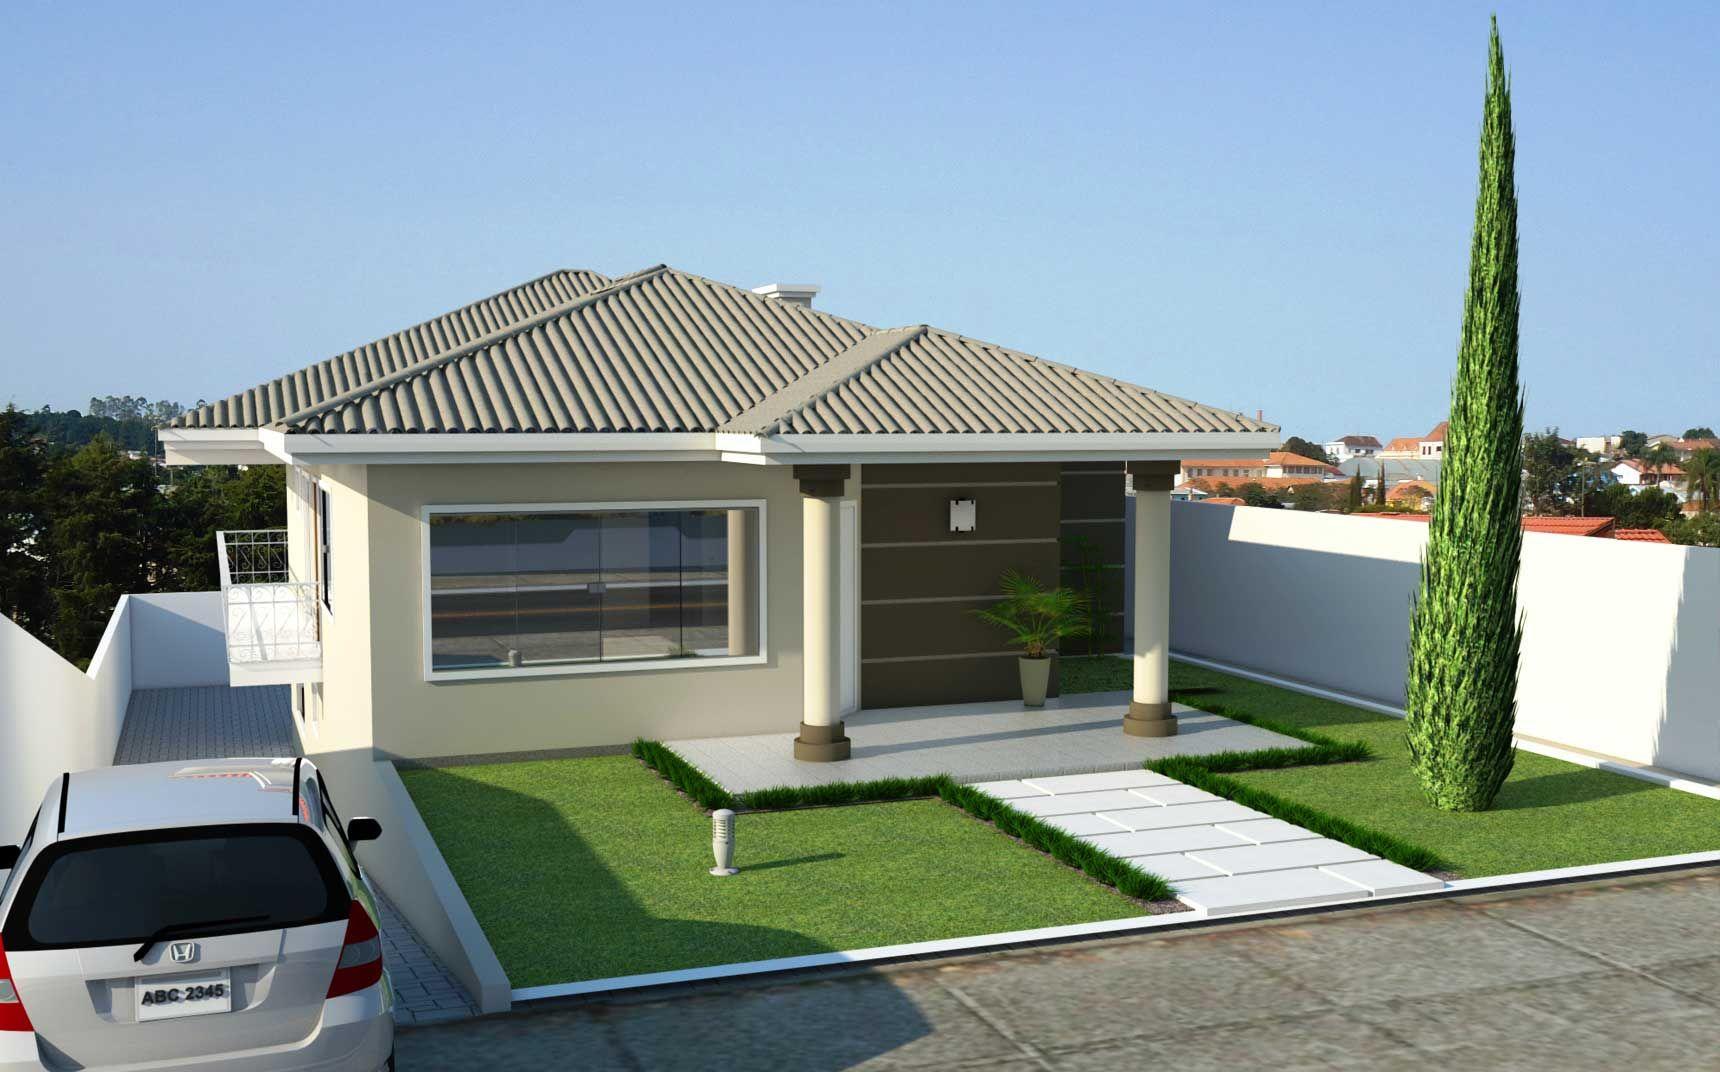 Pin de ala se lima em projetos constru o de casas casas for Fachadas de casas modernas en lima